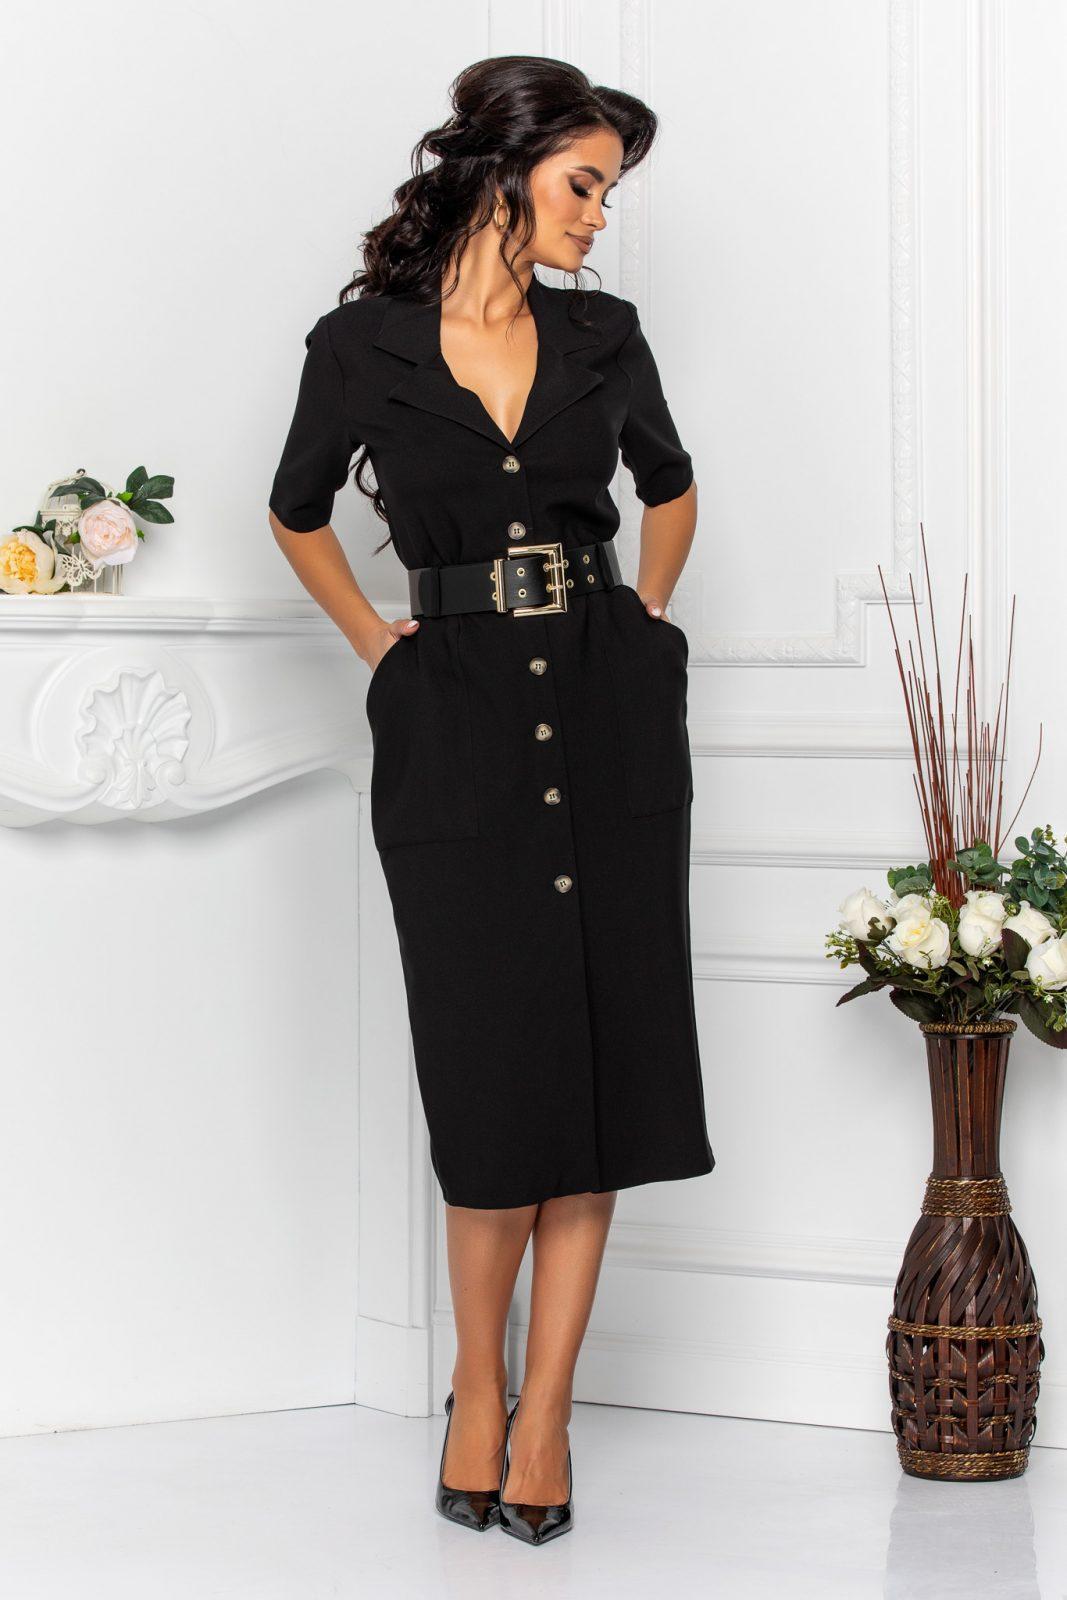 Onda Black Dress